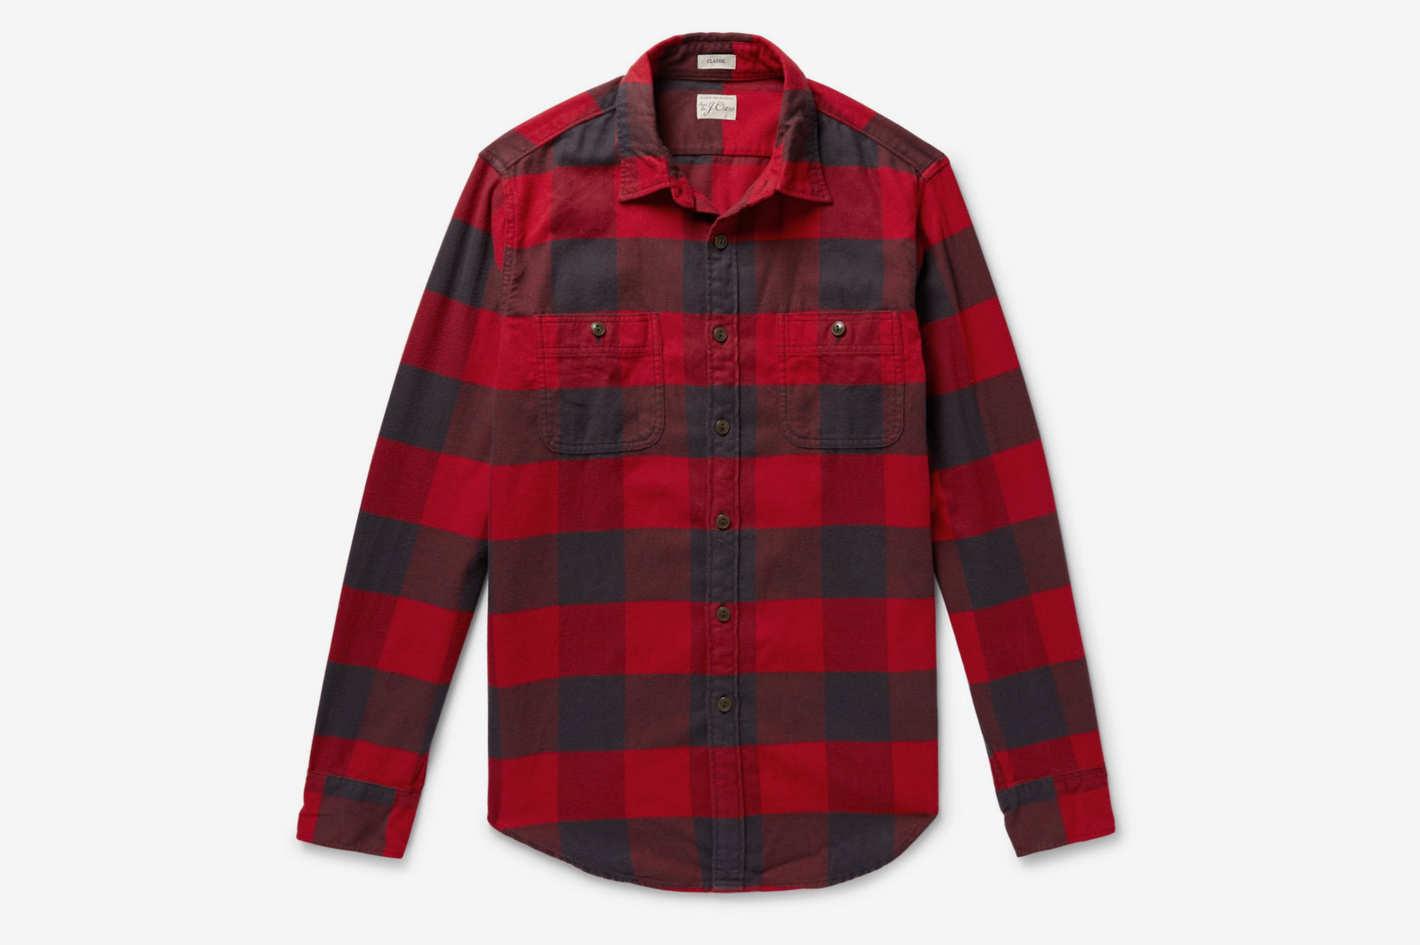 J.Crew Buffalo-Check Cotton-Flannel Shirt